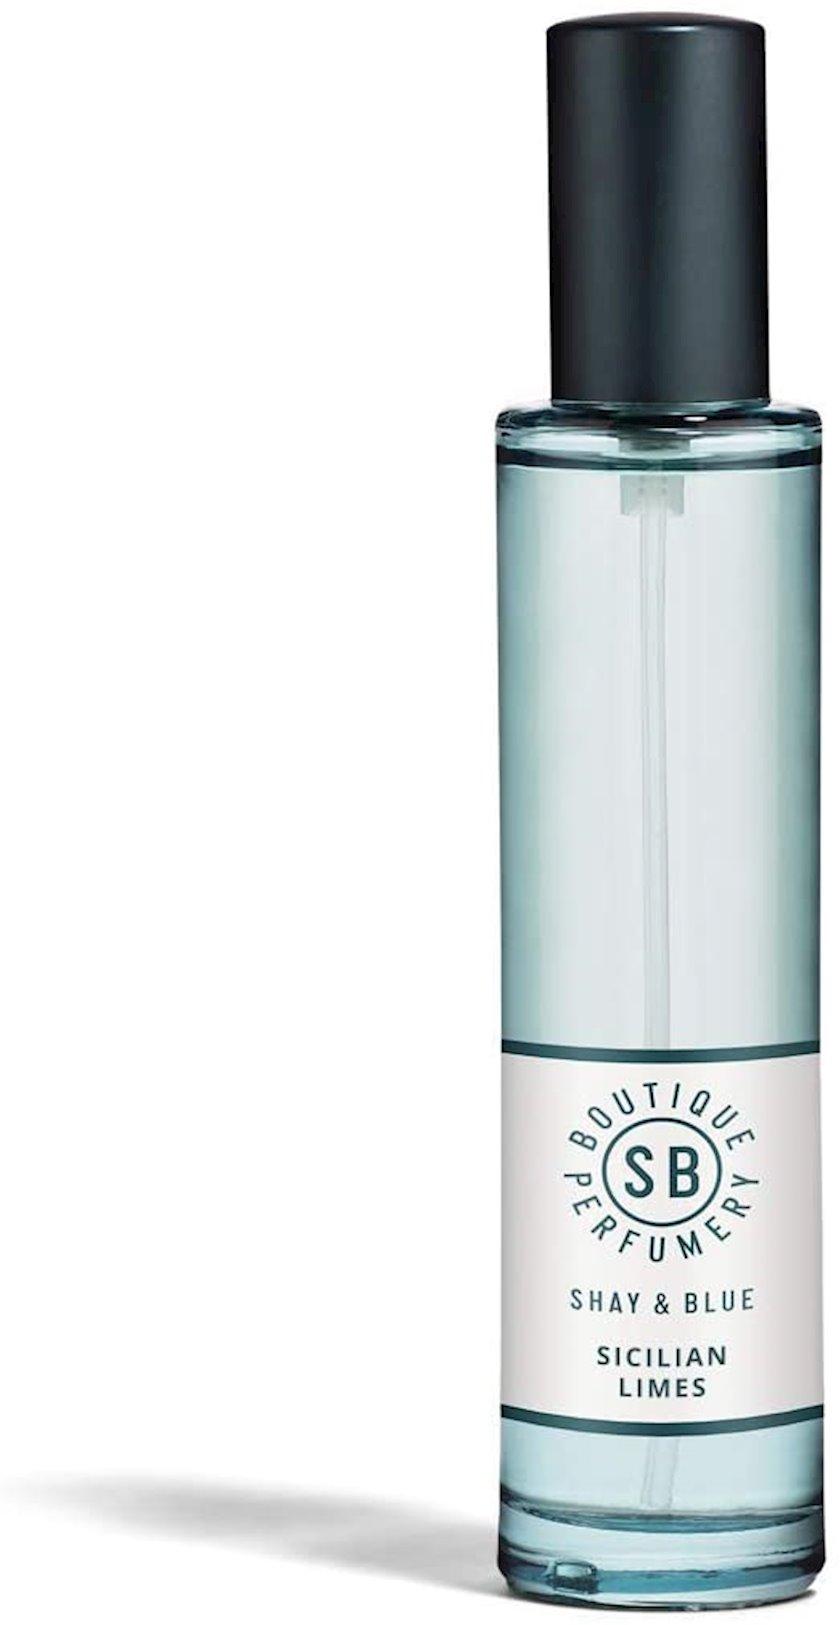 Ətir suyu Shay & Blue Sicilian Limes Natural Spray Fragrance Eau de Parfum 30 ml